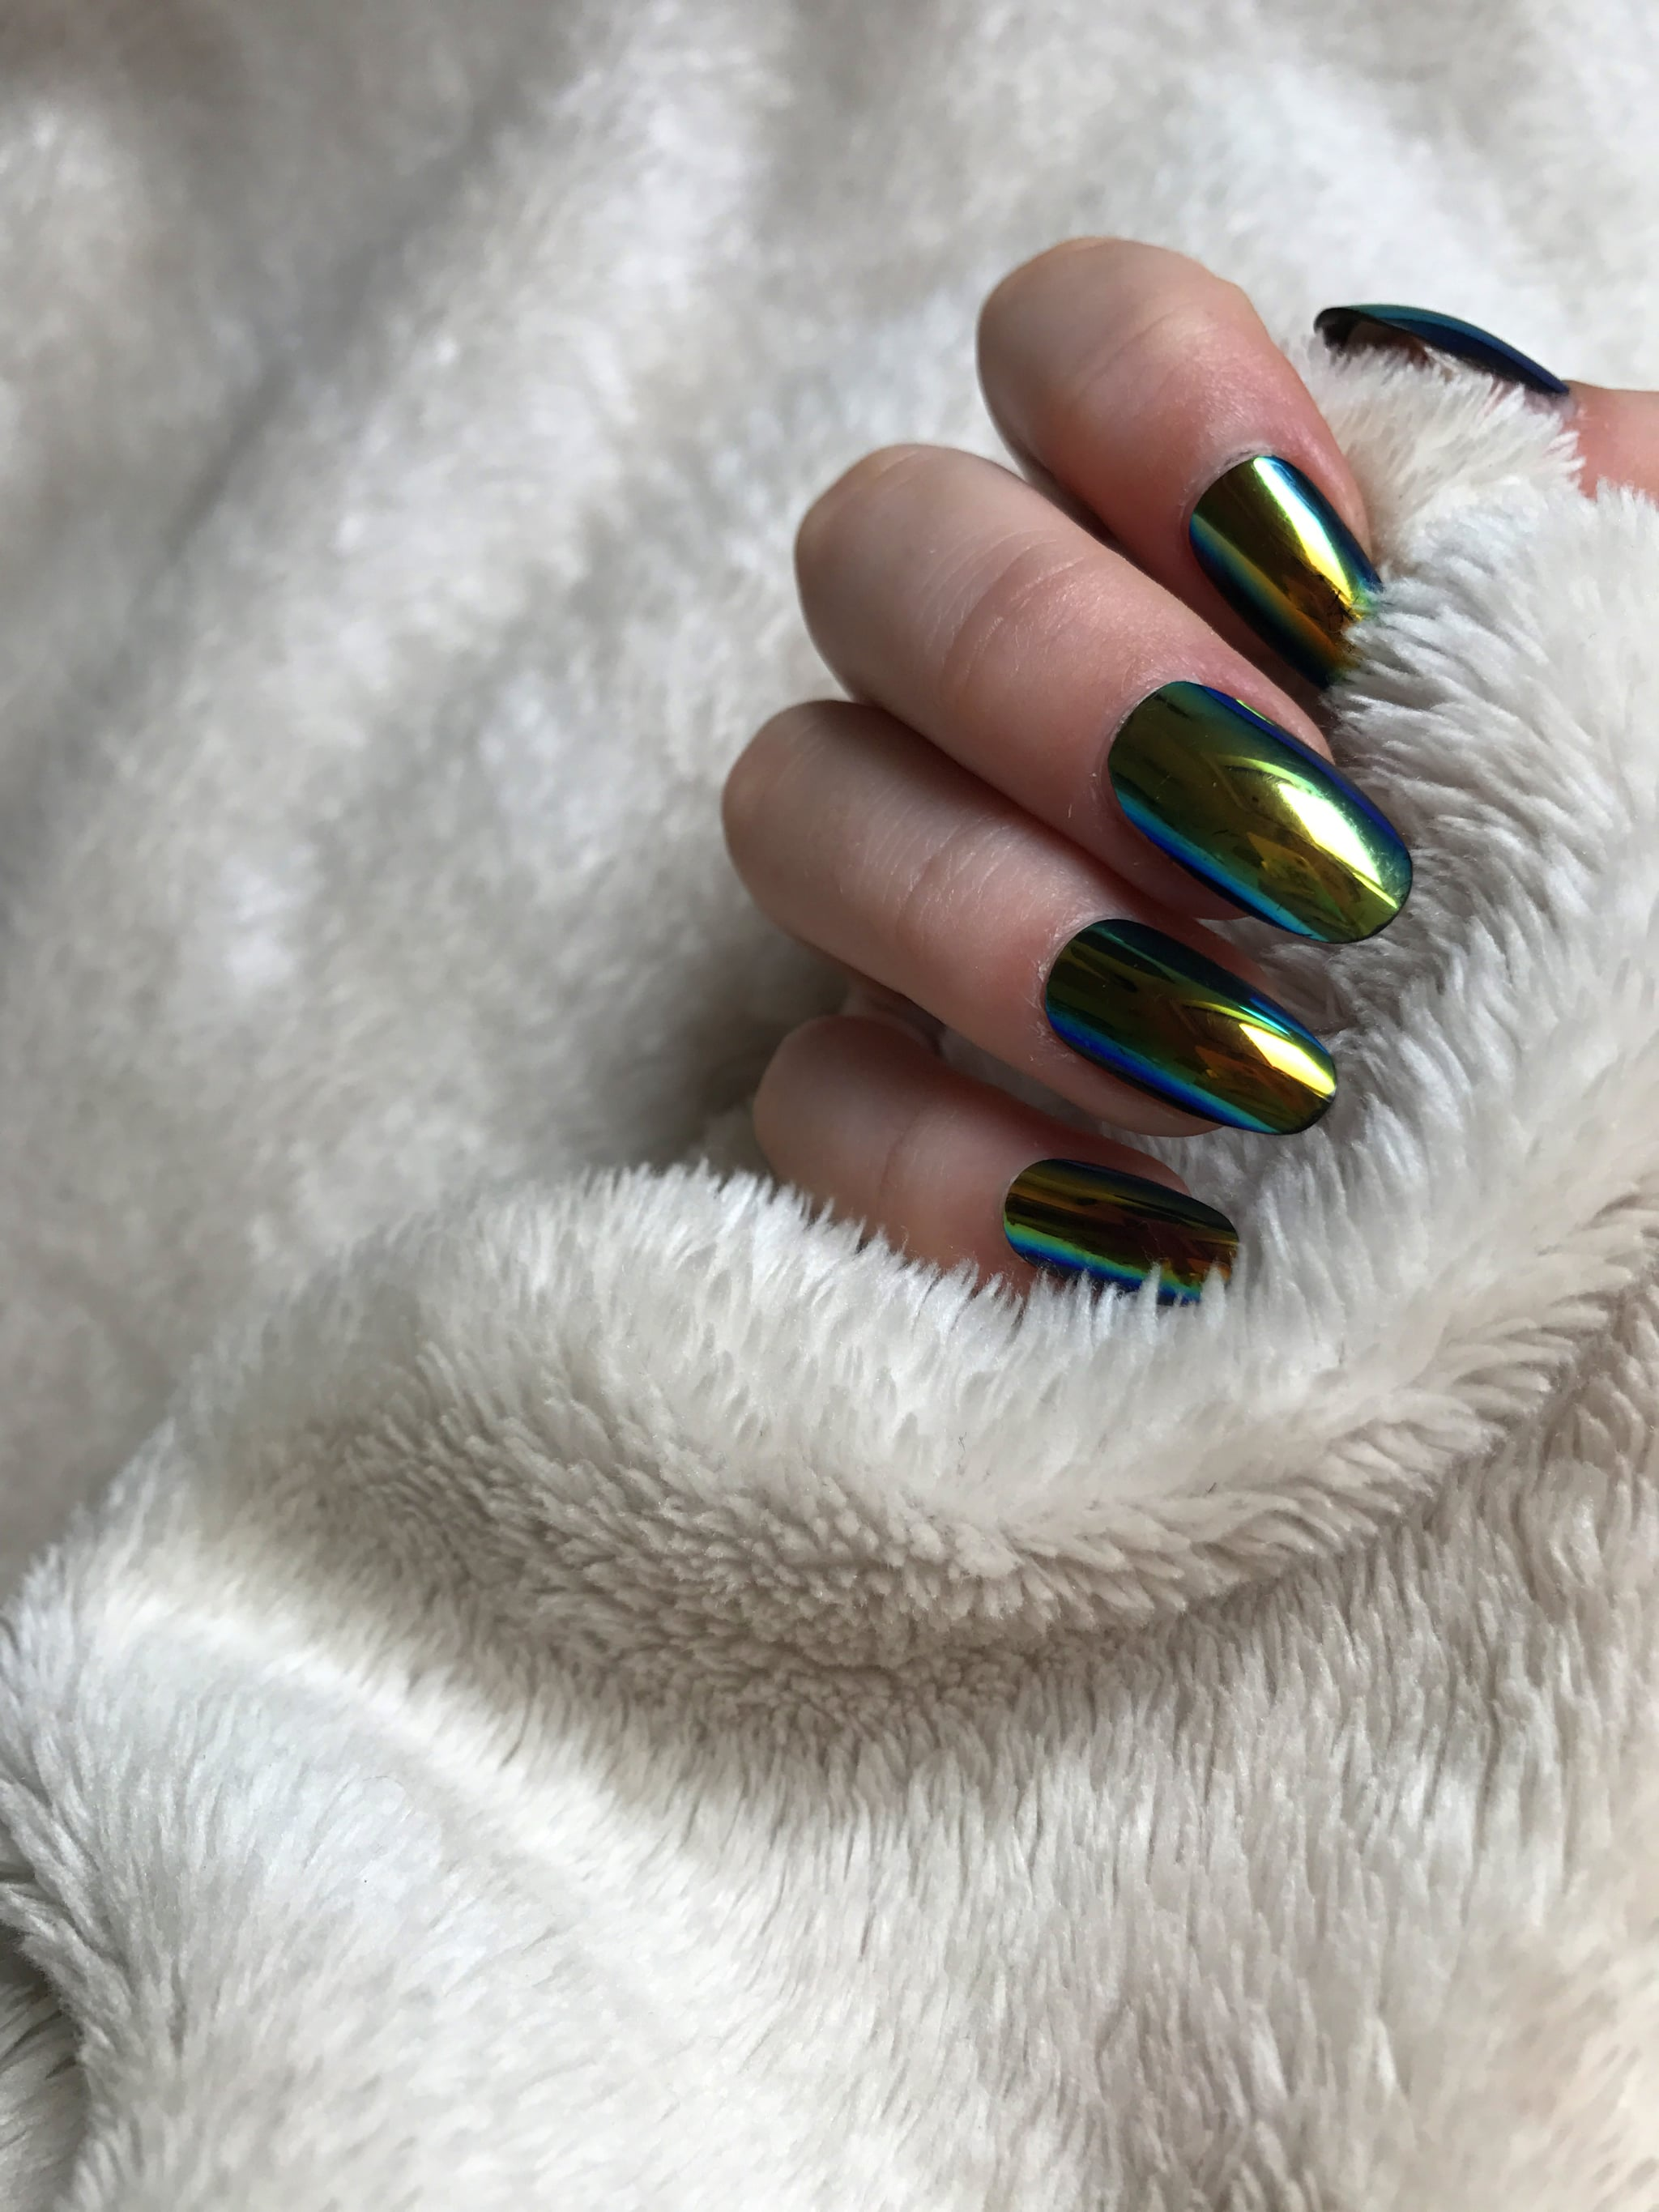 Elegant Touch Chrome Nails | POPSUGAR Beauty UK